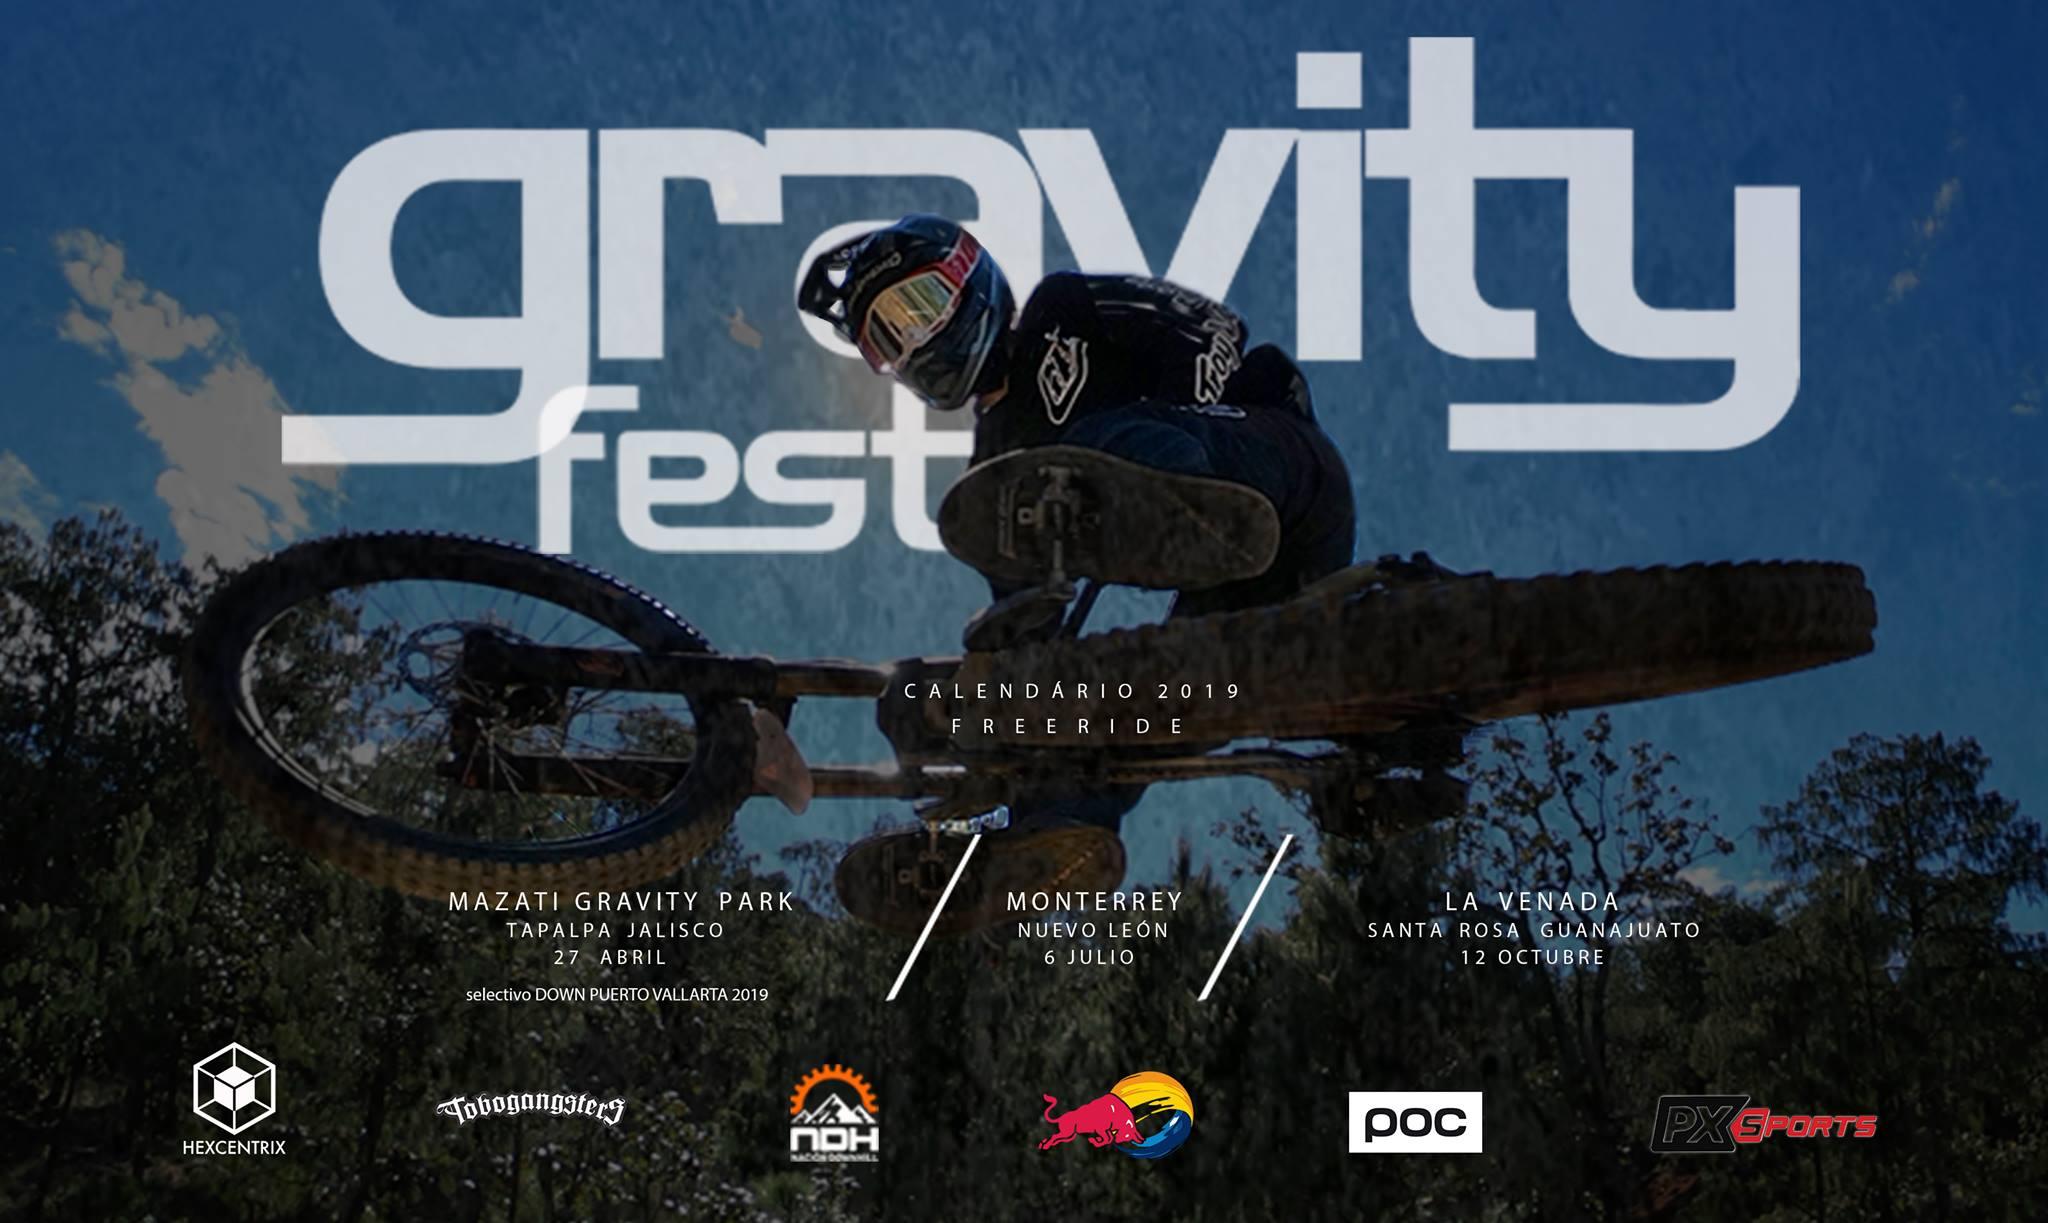 Gravity Fest